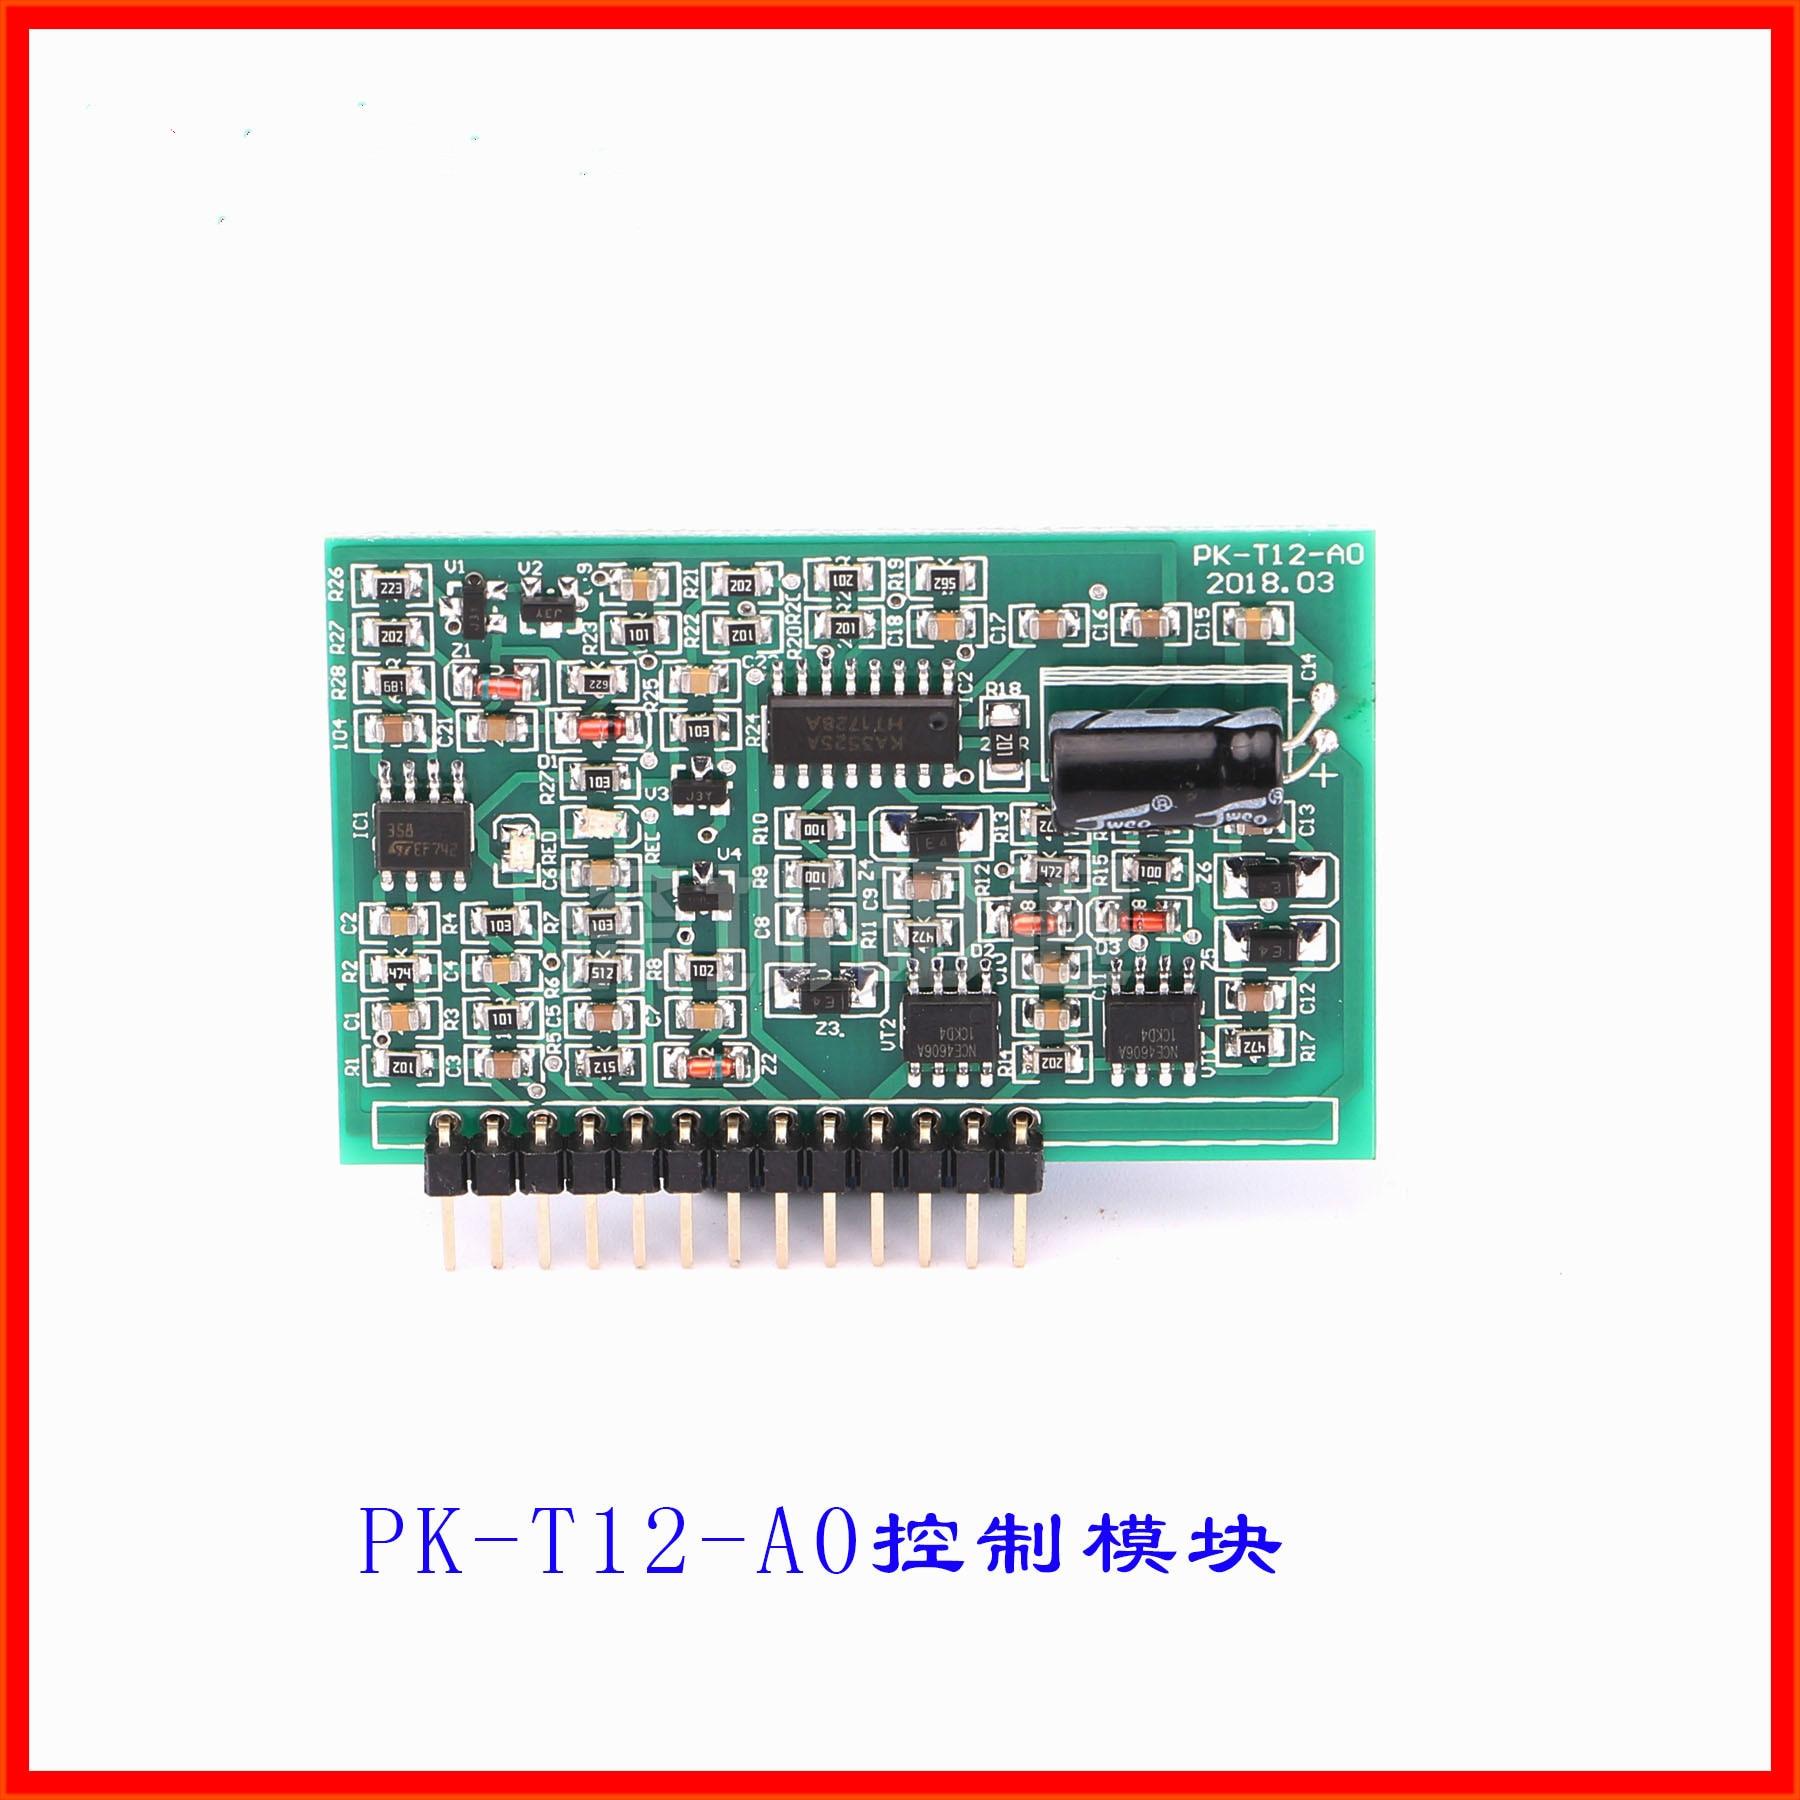 Inverter Welding Machine Parts PK-T12-A0 Control Module Small Vertical Board Double Voltage Welding Machine 3525 Control Board